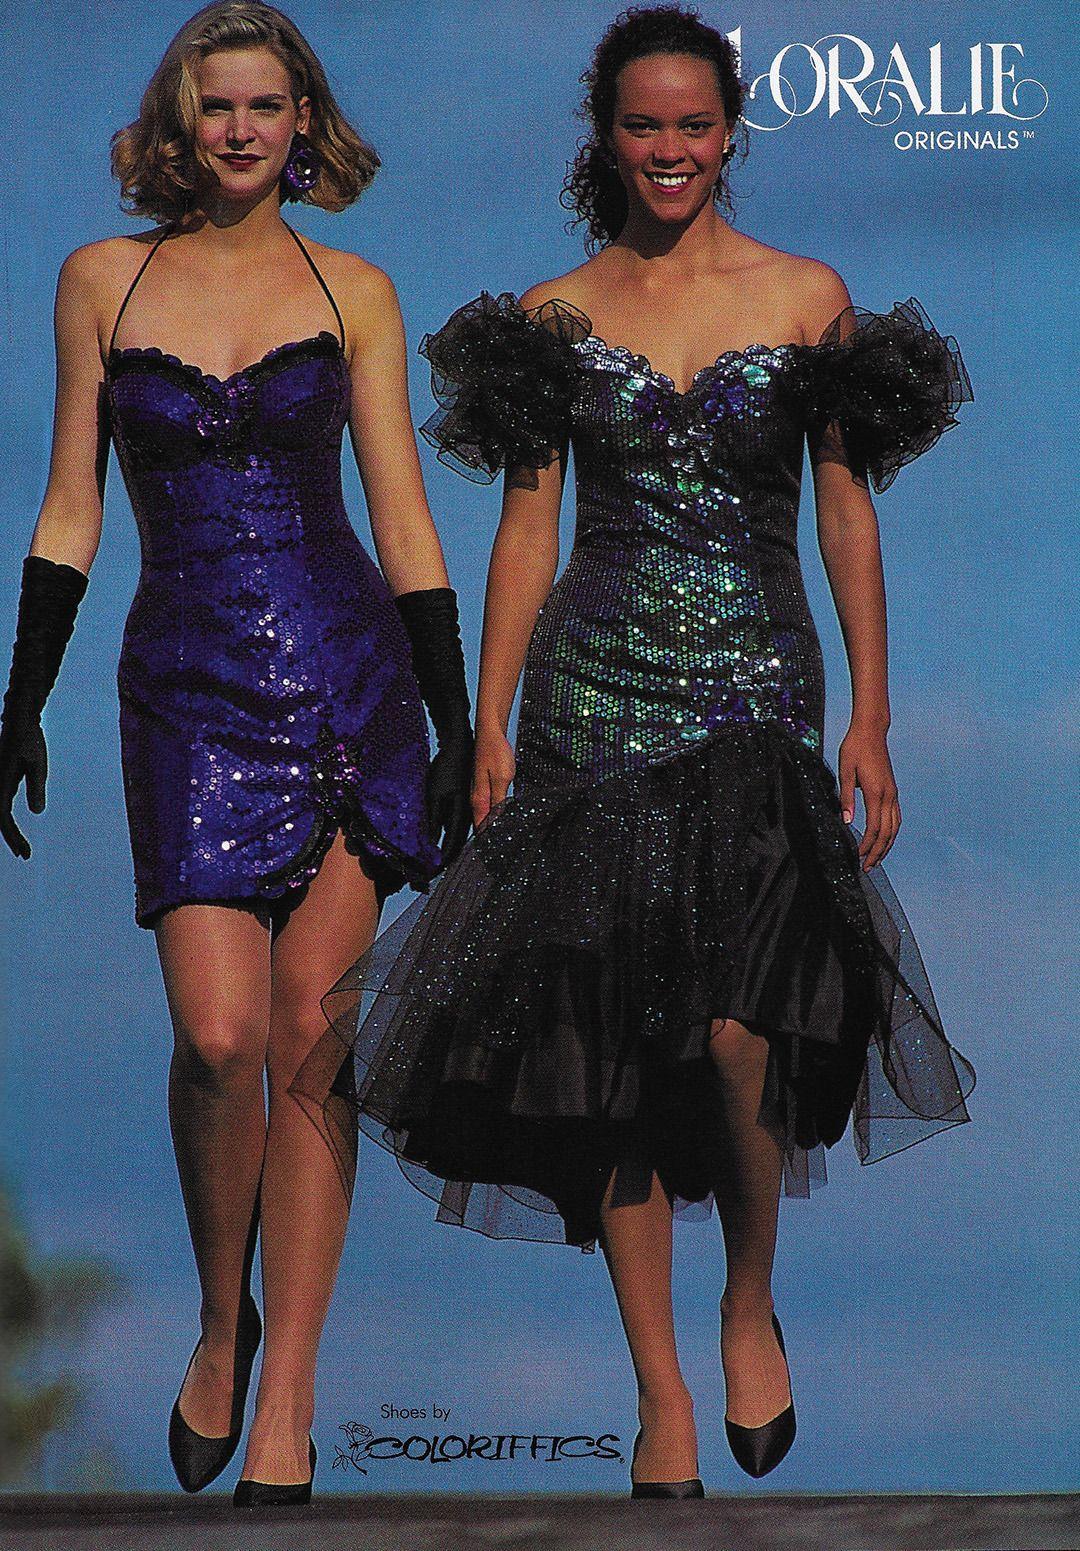 Just Seventeen February 1993 Loralie Originals Prom Dresses Vintage 80s Prom Dress Vintage Prom [ 1551 x 1080 Pixel ]